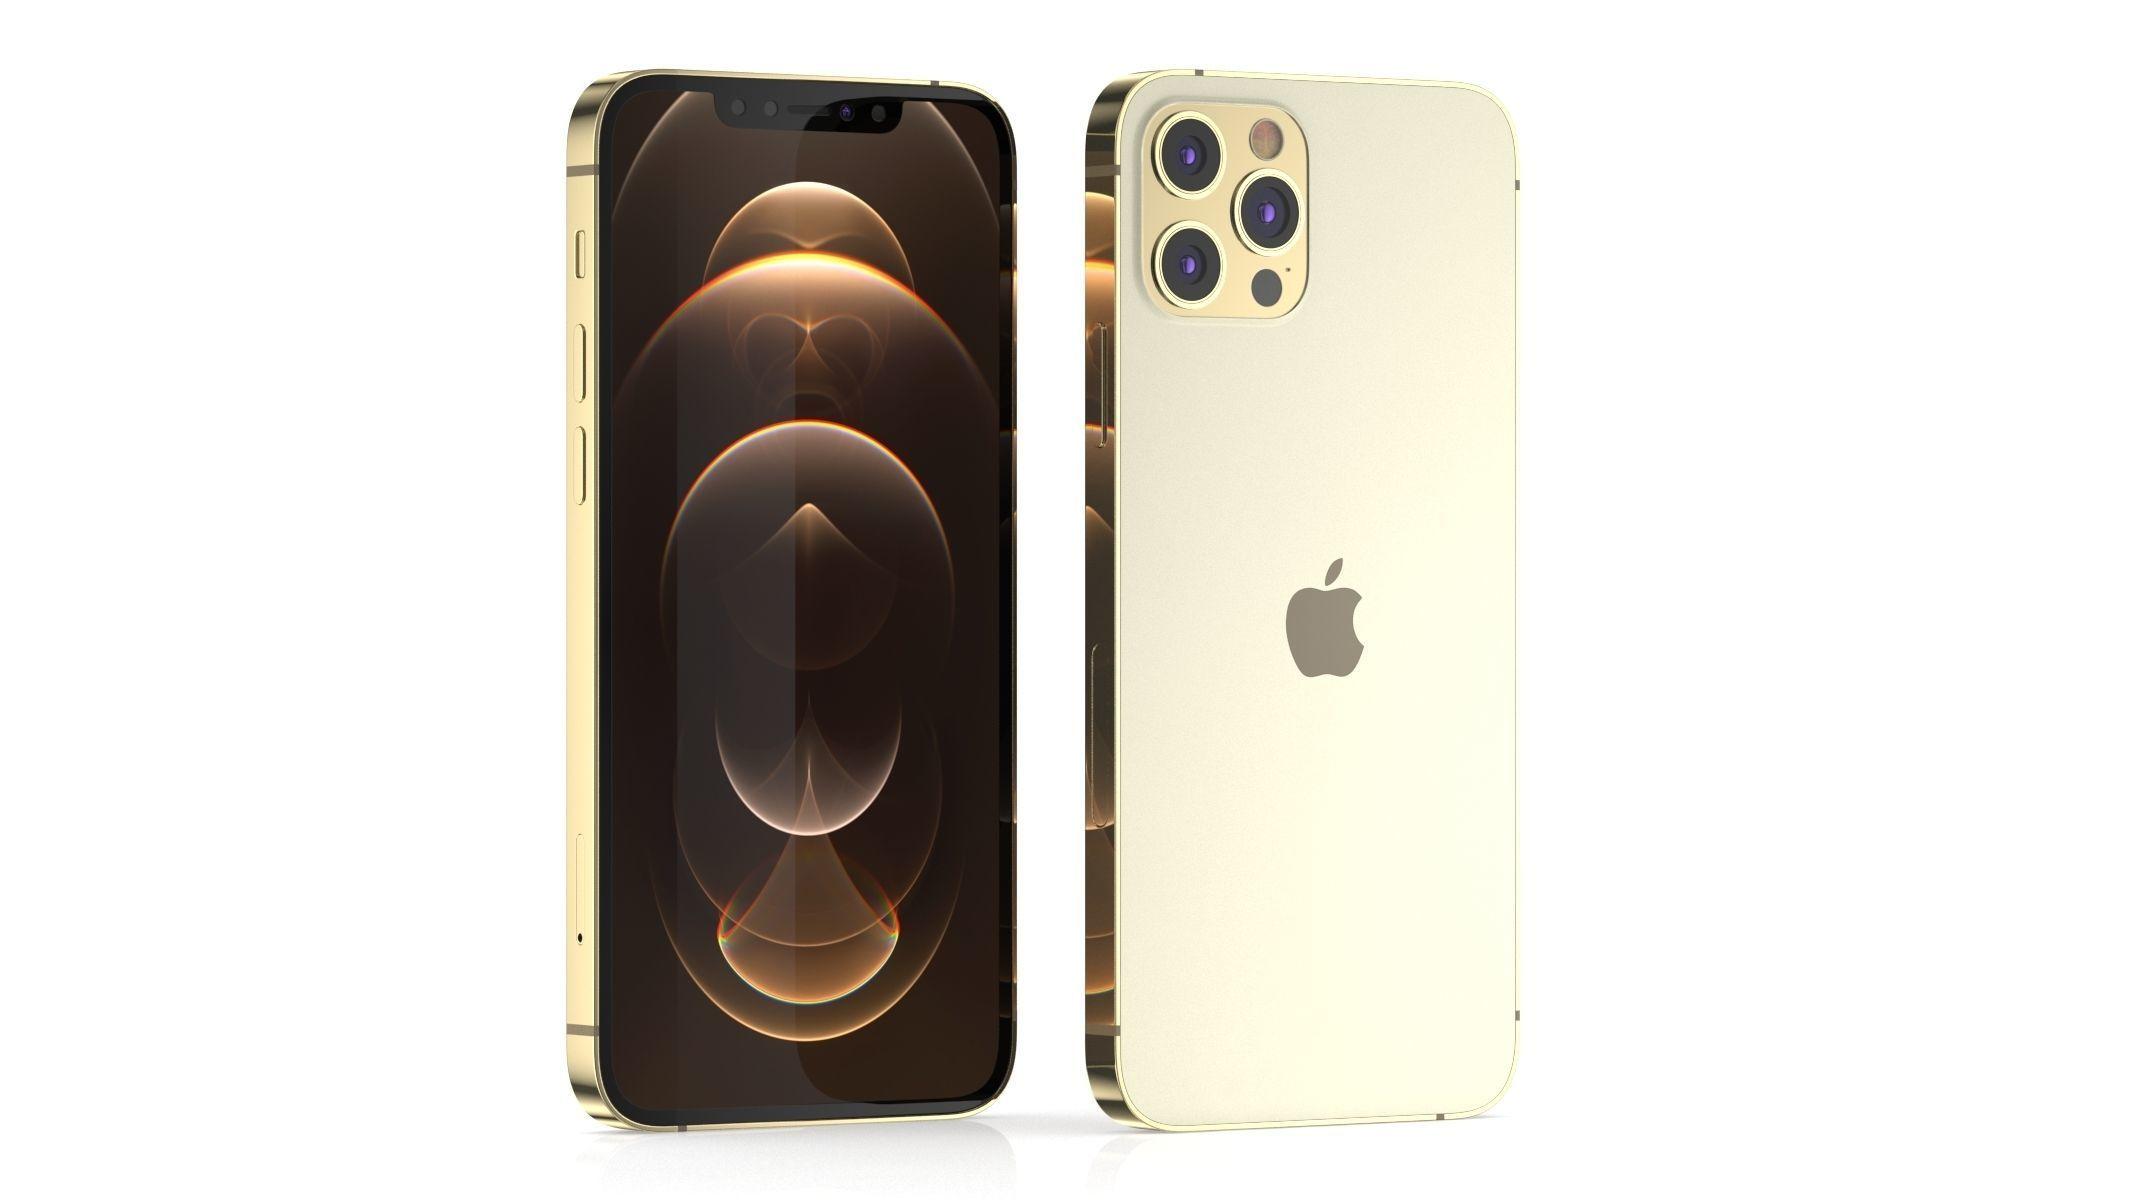 buy cheap iphone 12 pro